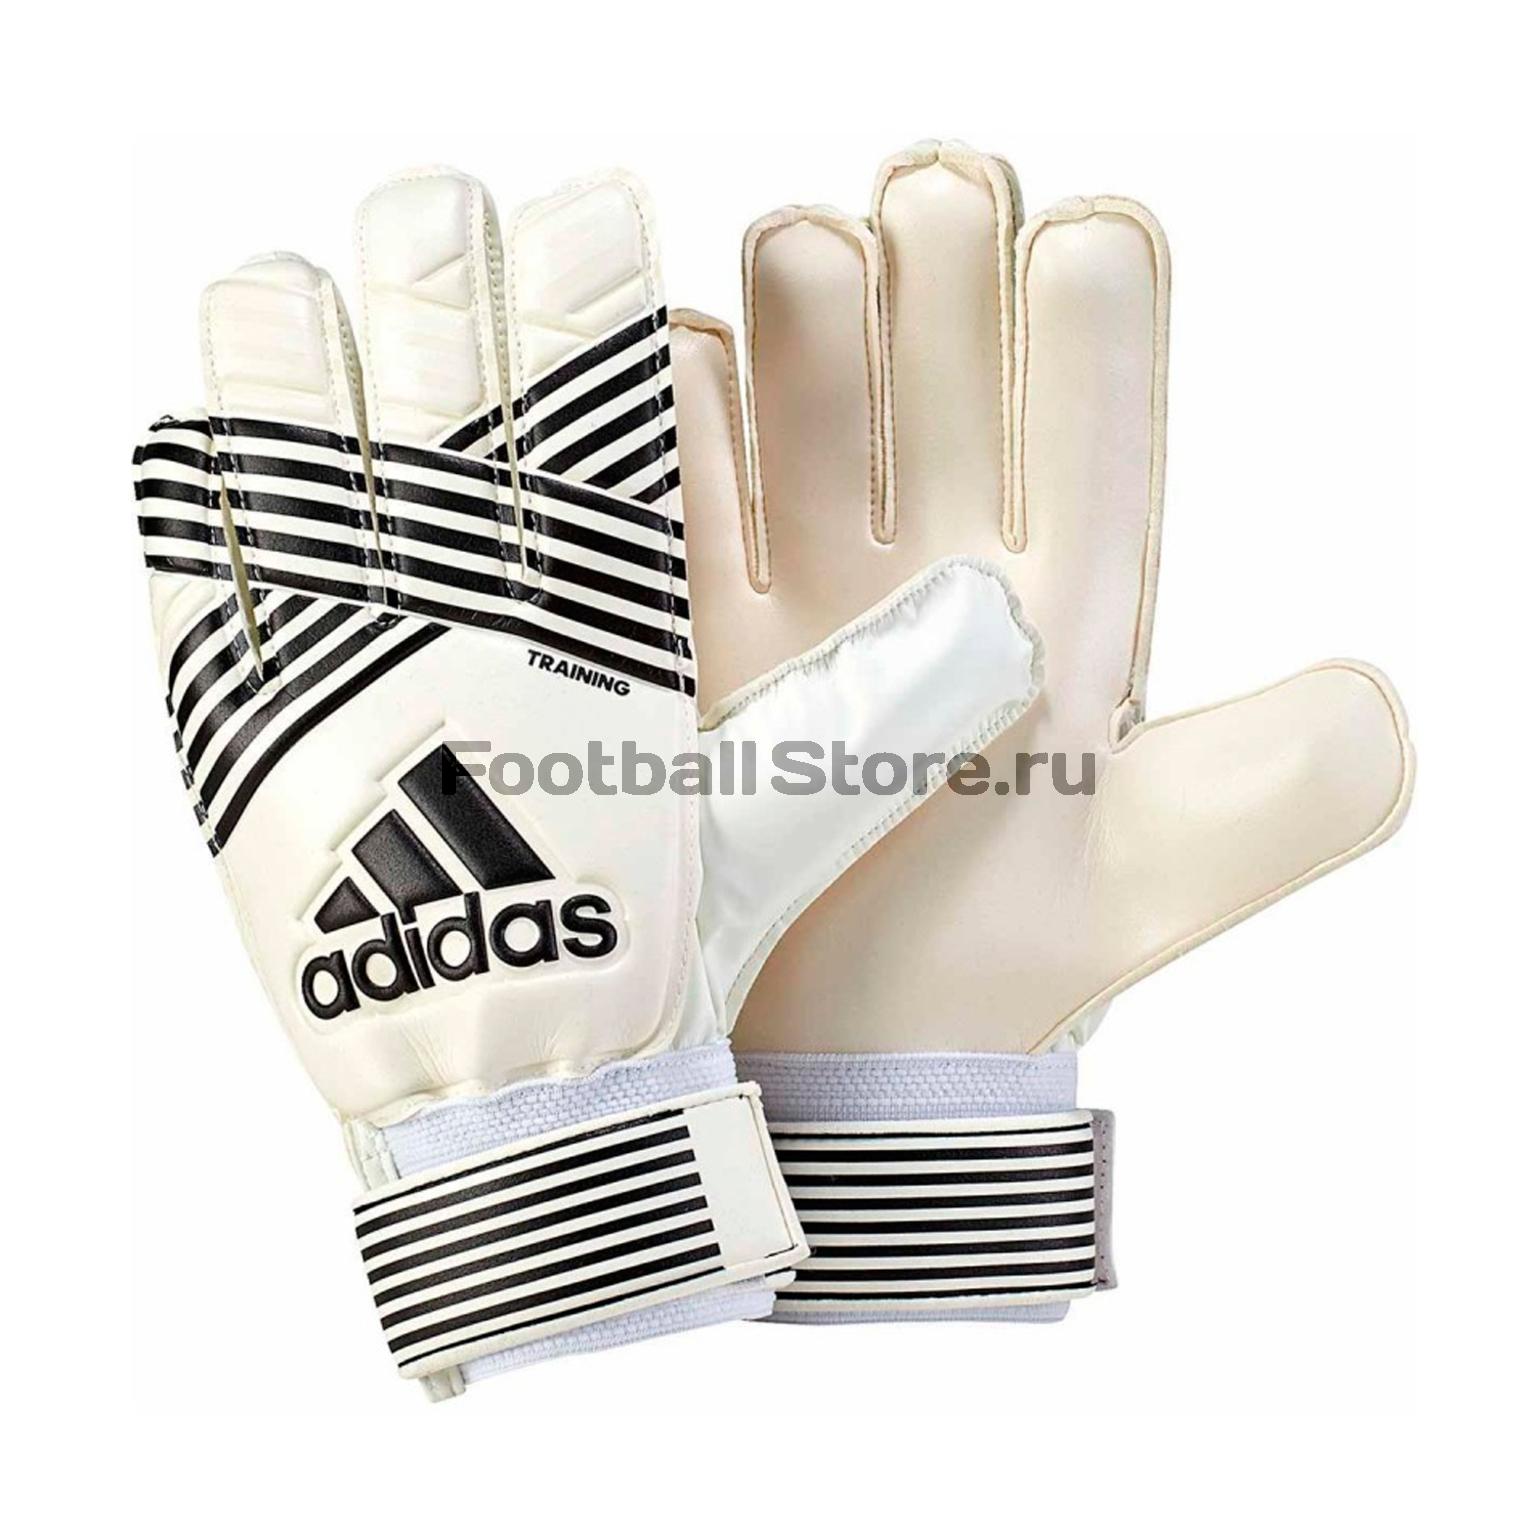 Перчатки вратарские Adidas Ace Training BQ4582 перчатки adidas перчатки вратарские adidas ace magnetic st cd9131